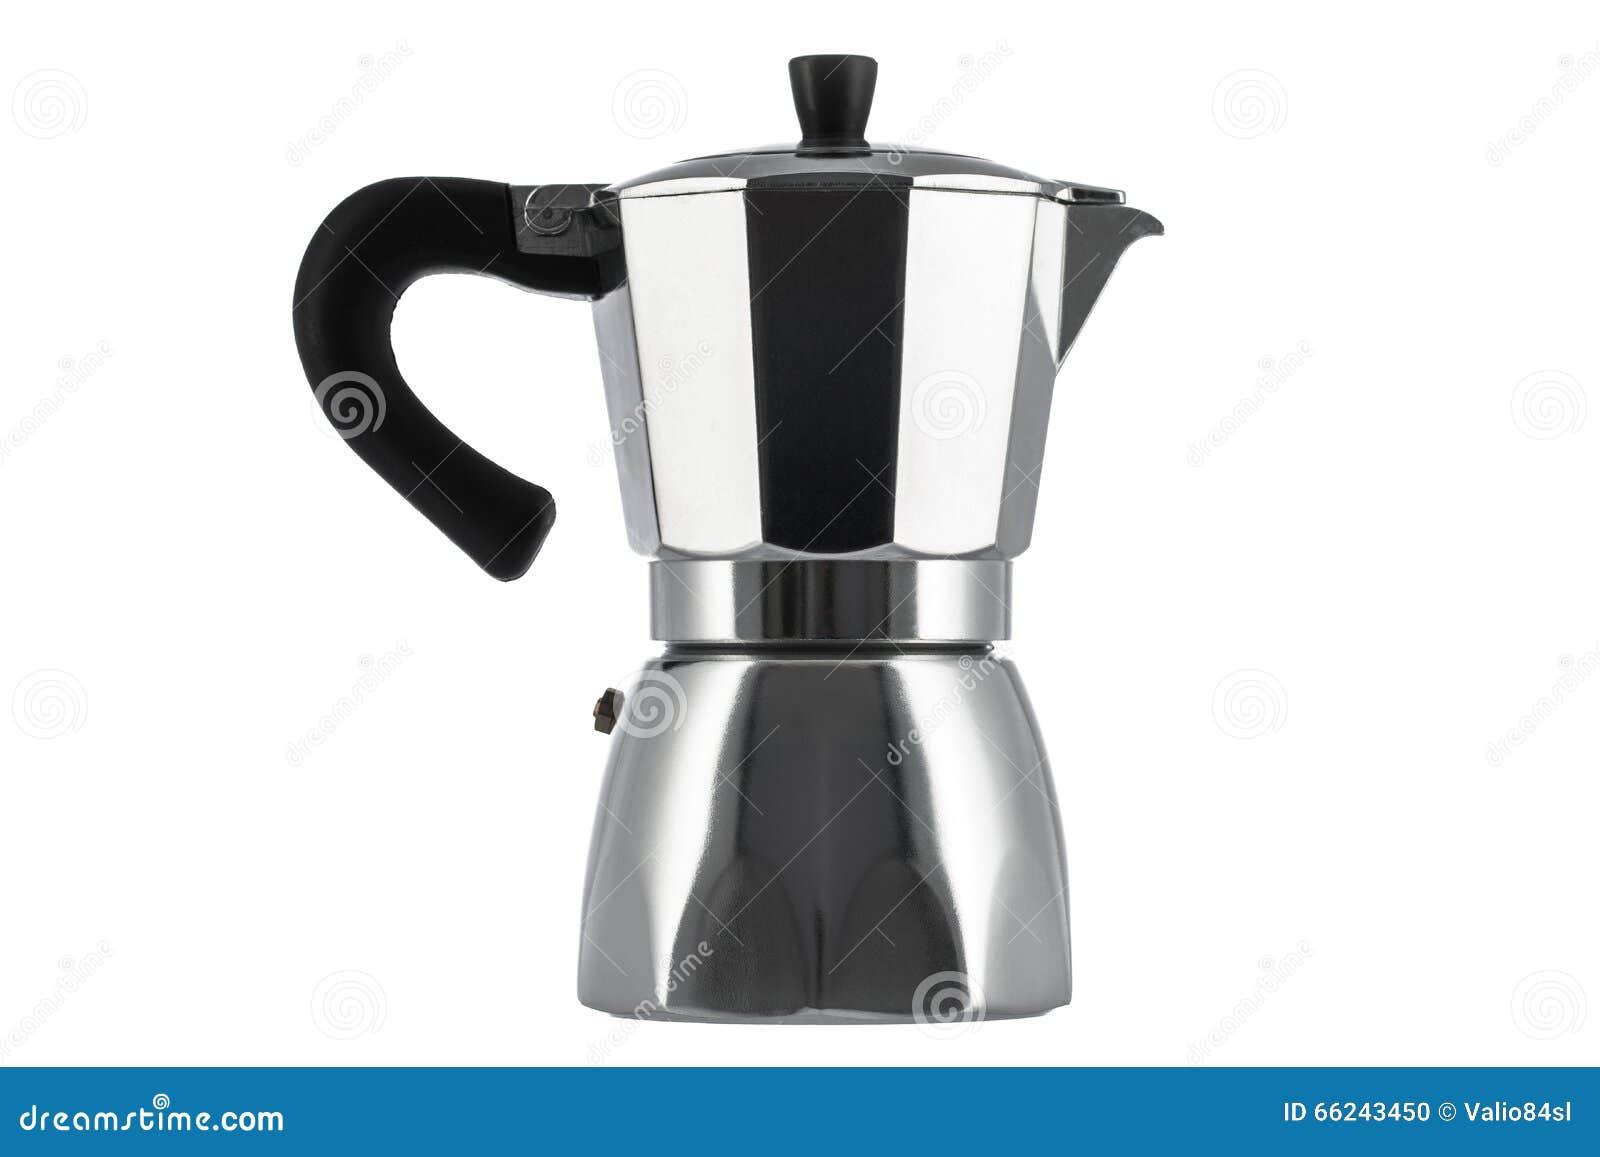 Italian Coffee Maker Vector : Italian Coffee Maker Isolated On White Stock Photo - Image: 66243450